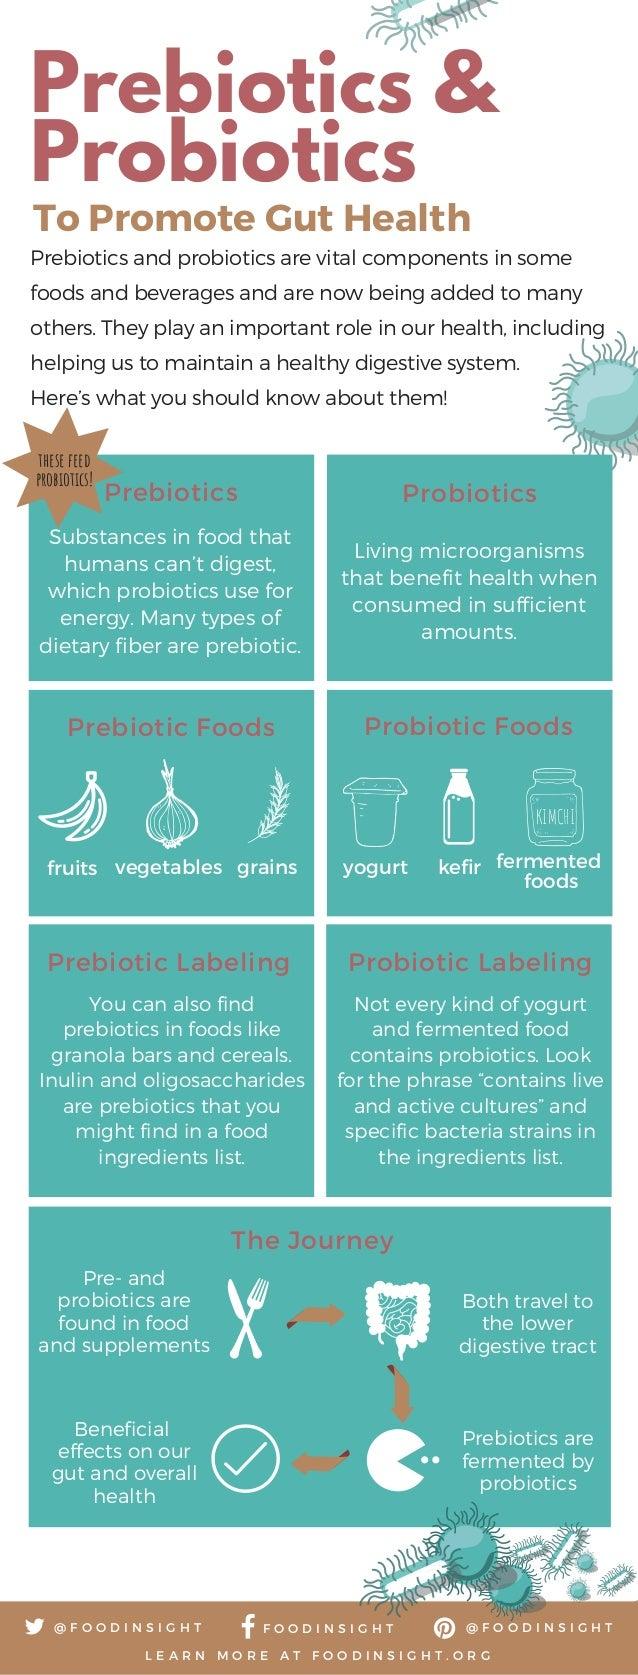 Prebiotics & Probiotics P A R K S & W I L D L I F E A D M I N I S T R A T I O N To Promote Gut Health Prebiotics and probi...